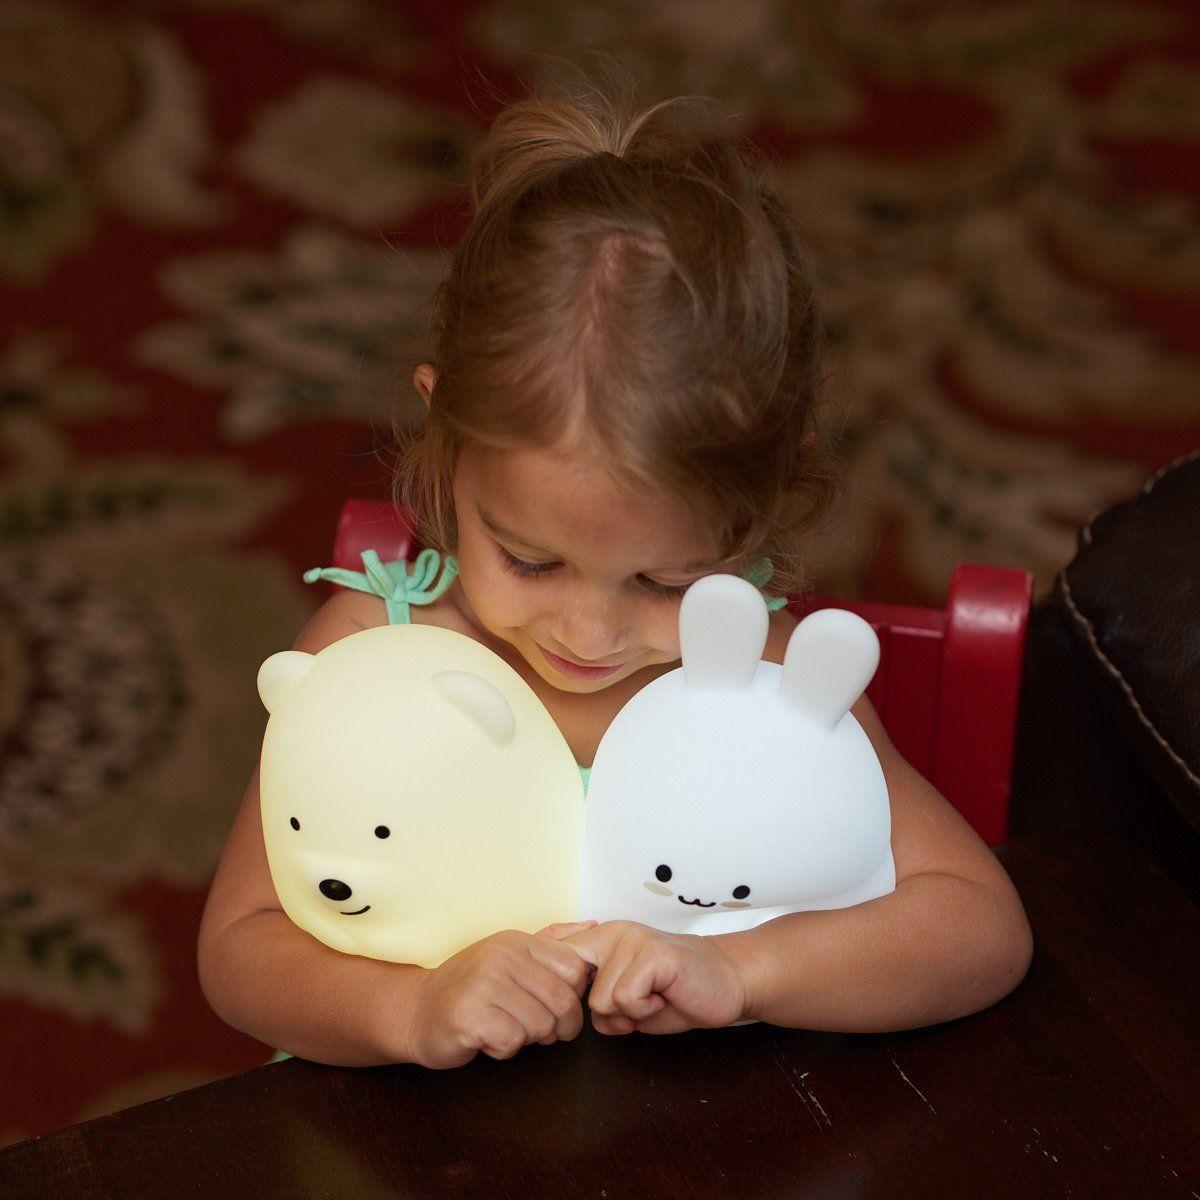 Led Nursery Night Lights For Kids Lumipets Cute Animal Silicone